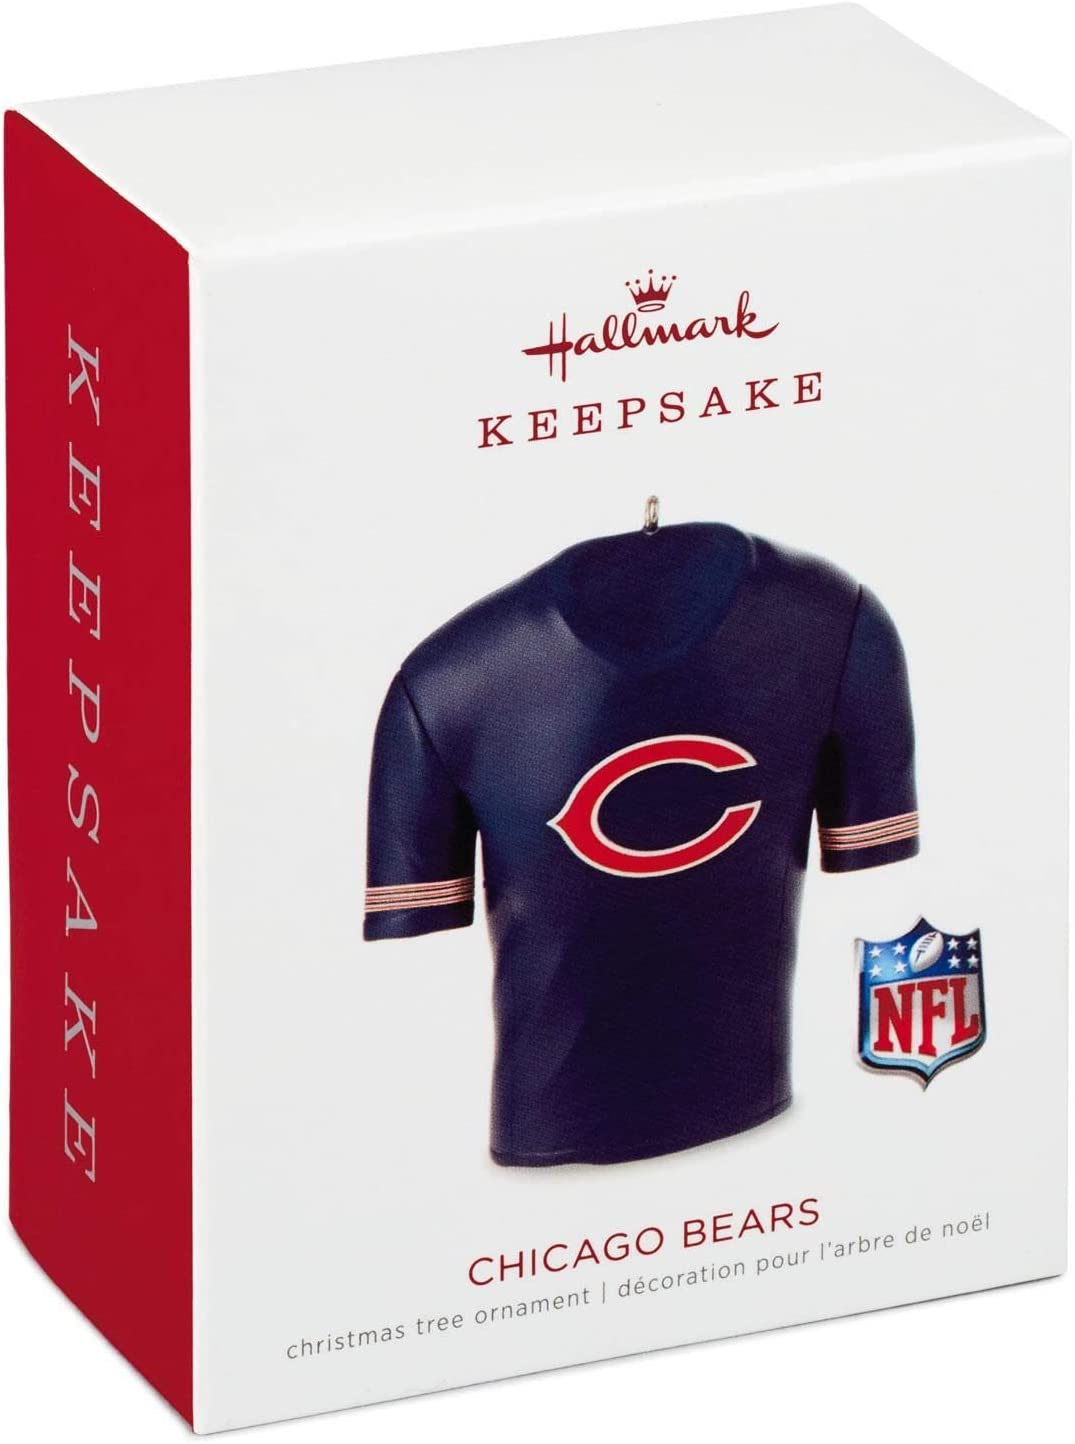 Chicago Cubs Jersey 2018 Hallmark Keepsake Christmas Ornament